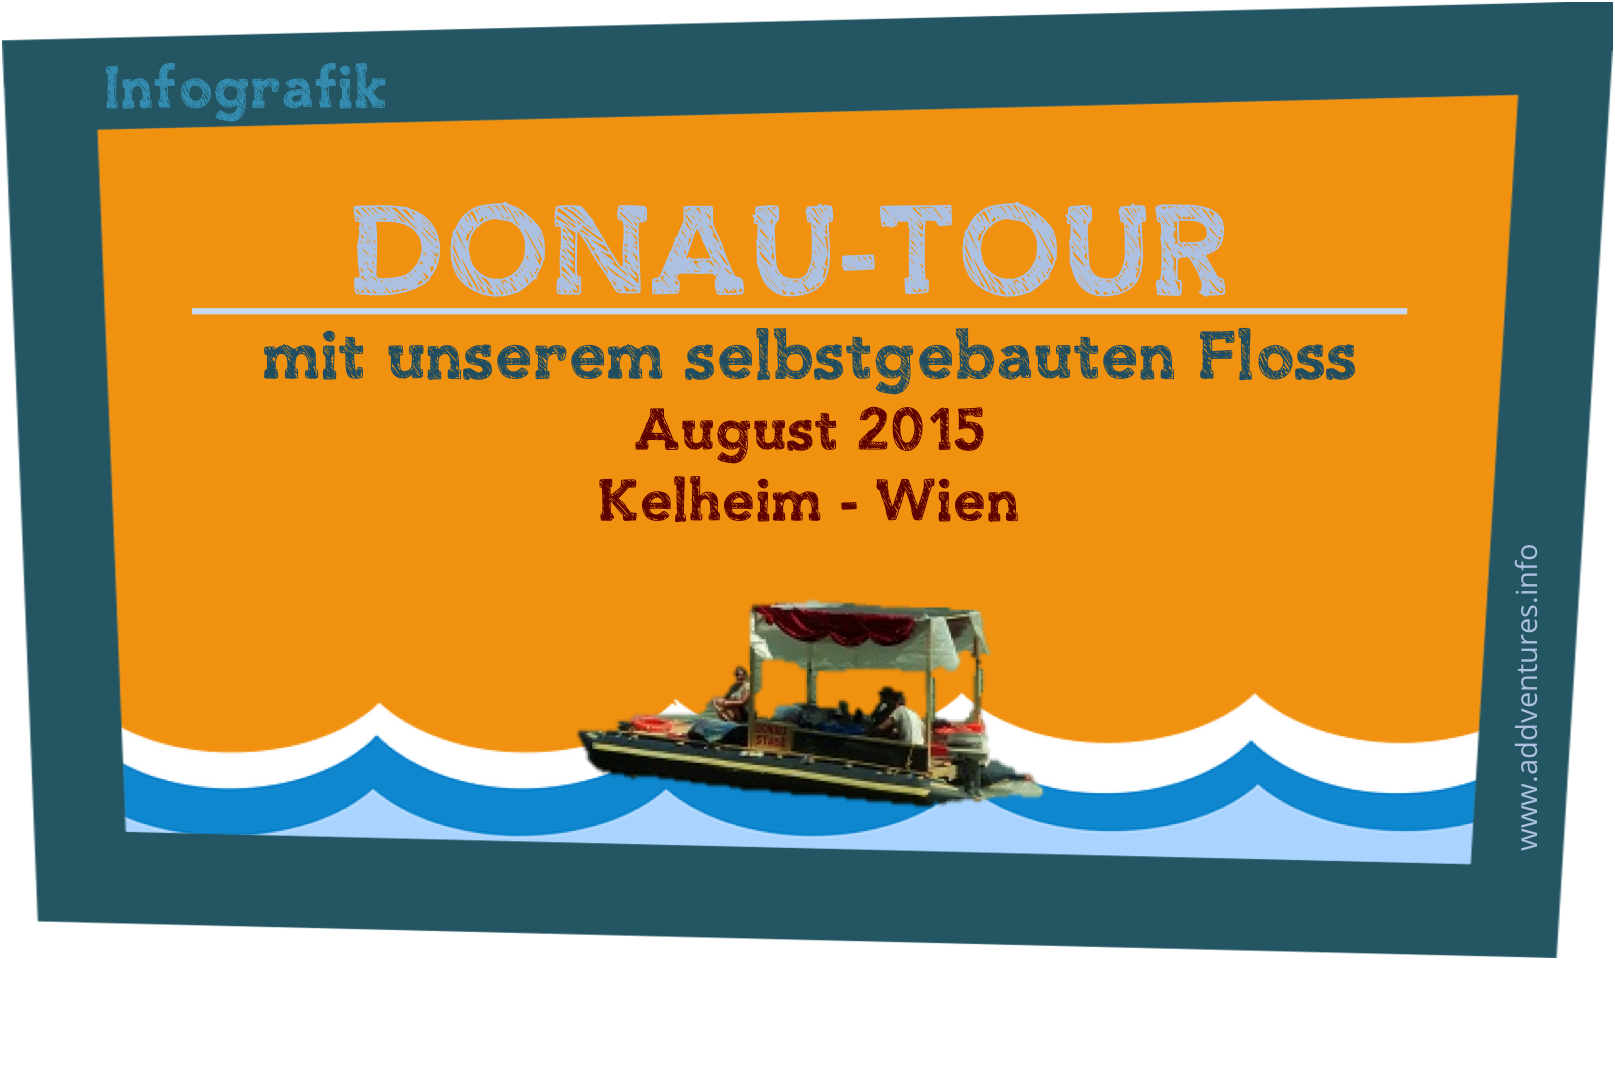 Donau-Floß Infografik